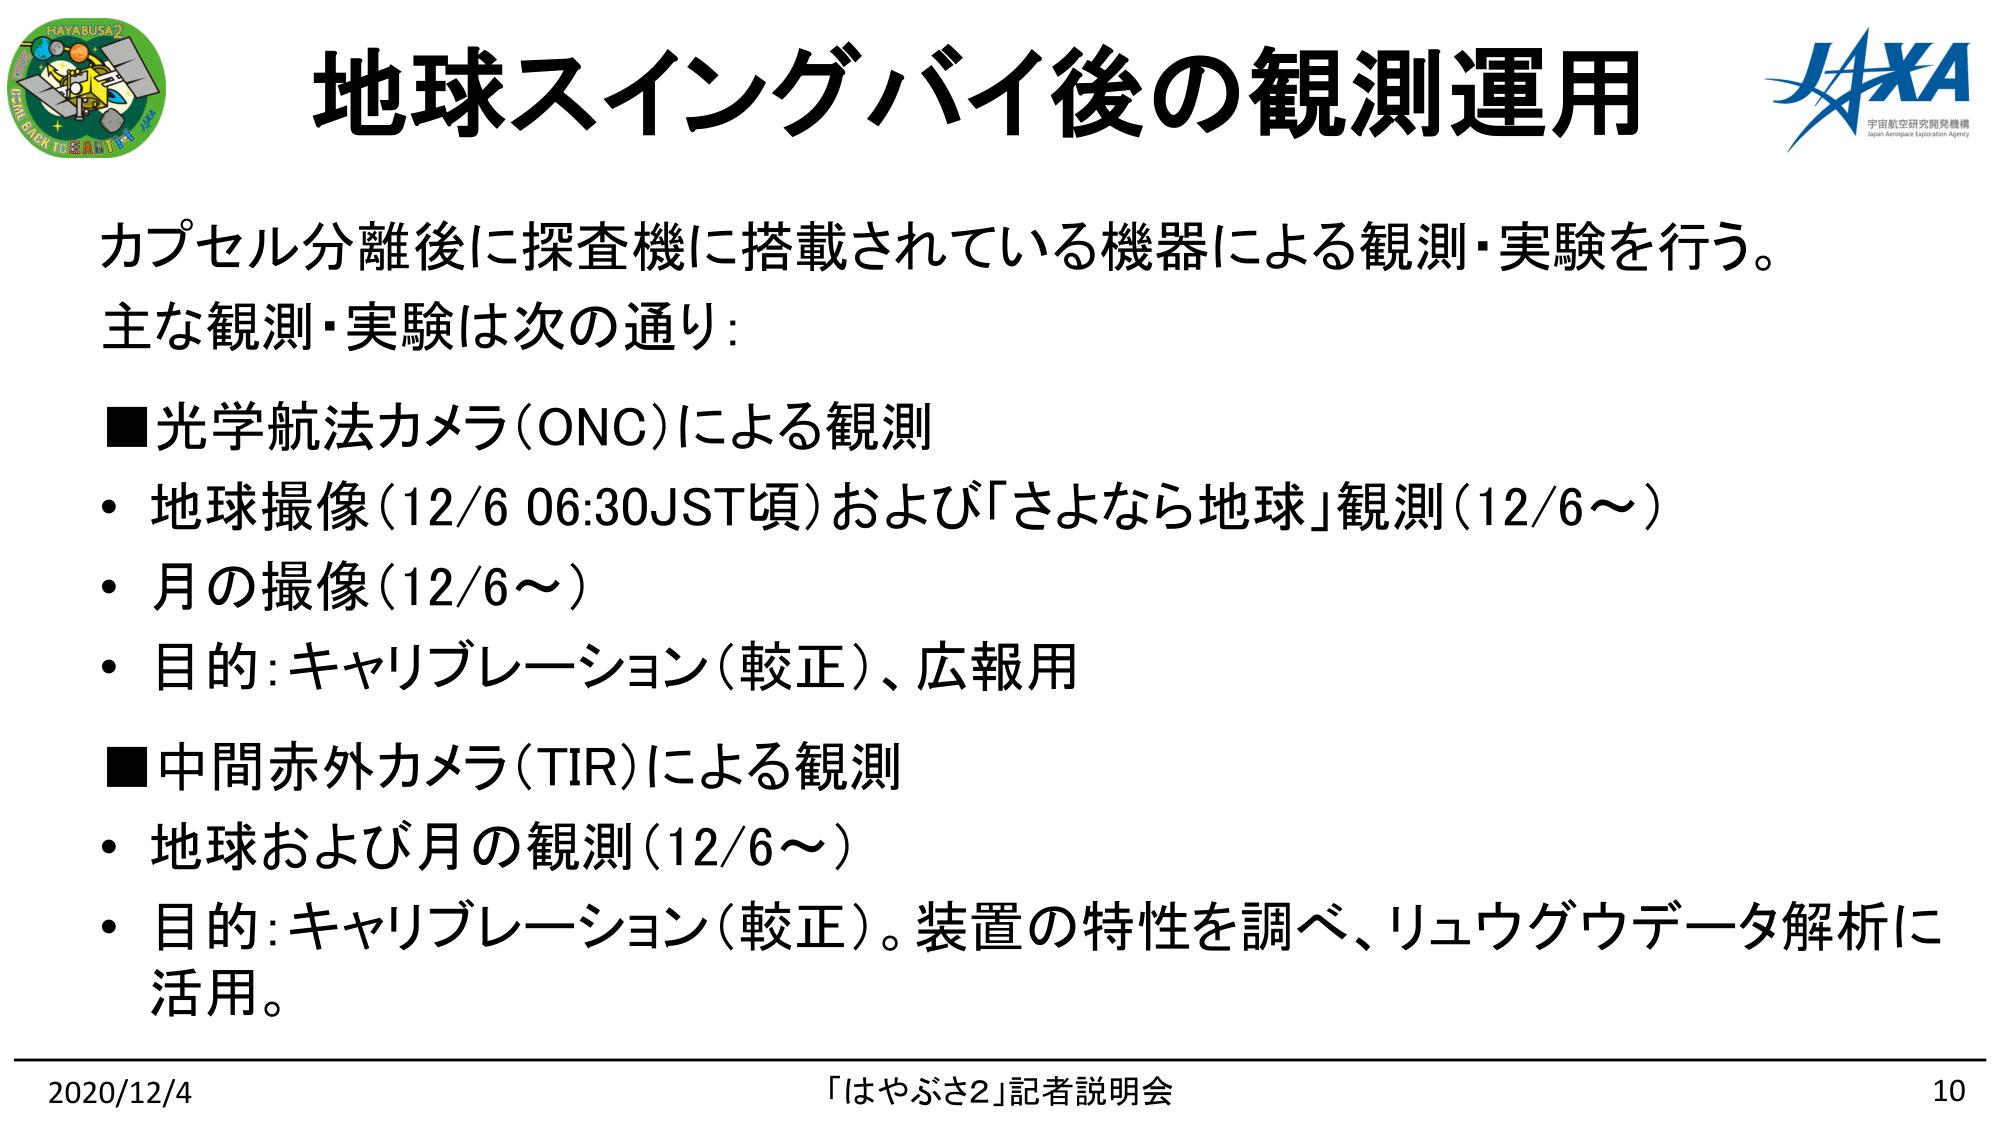 f:id:Imamura:20201204153832p:plain